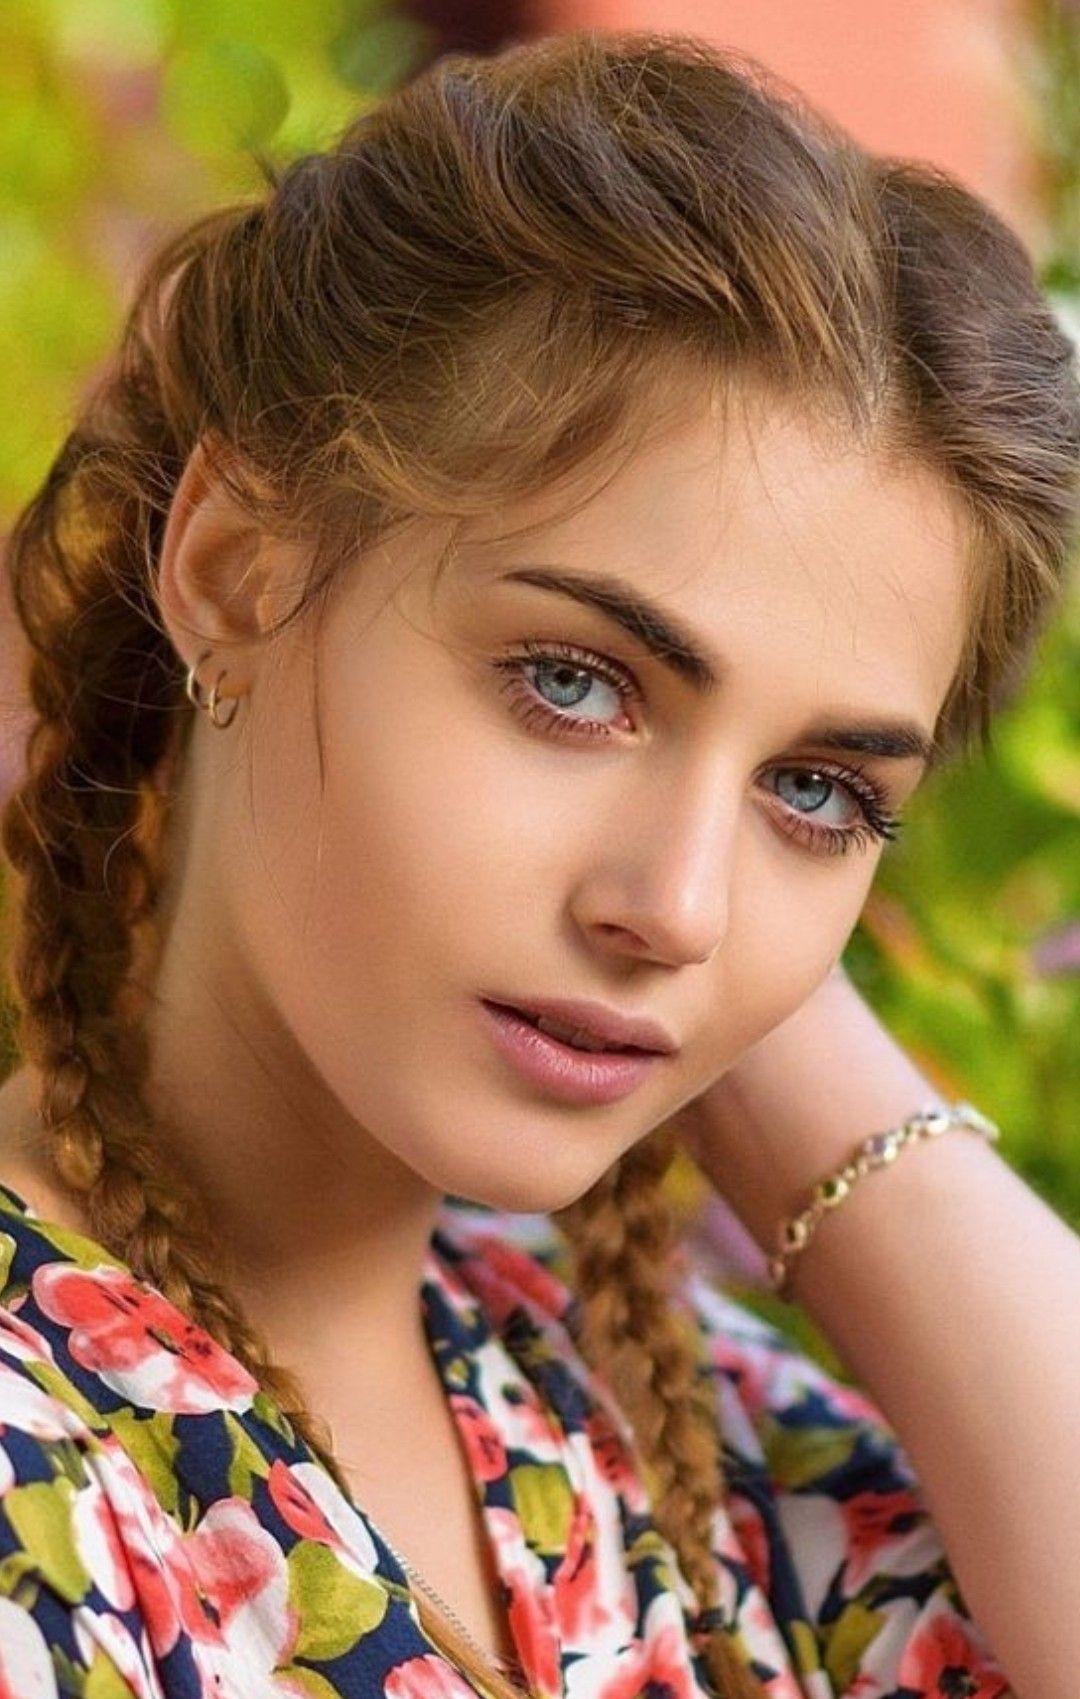 12june2019wednesday Nobody Cares Beautiful Girl Face